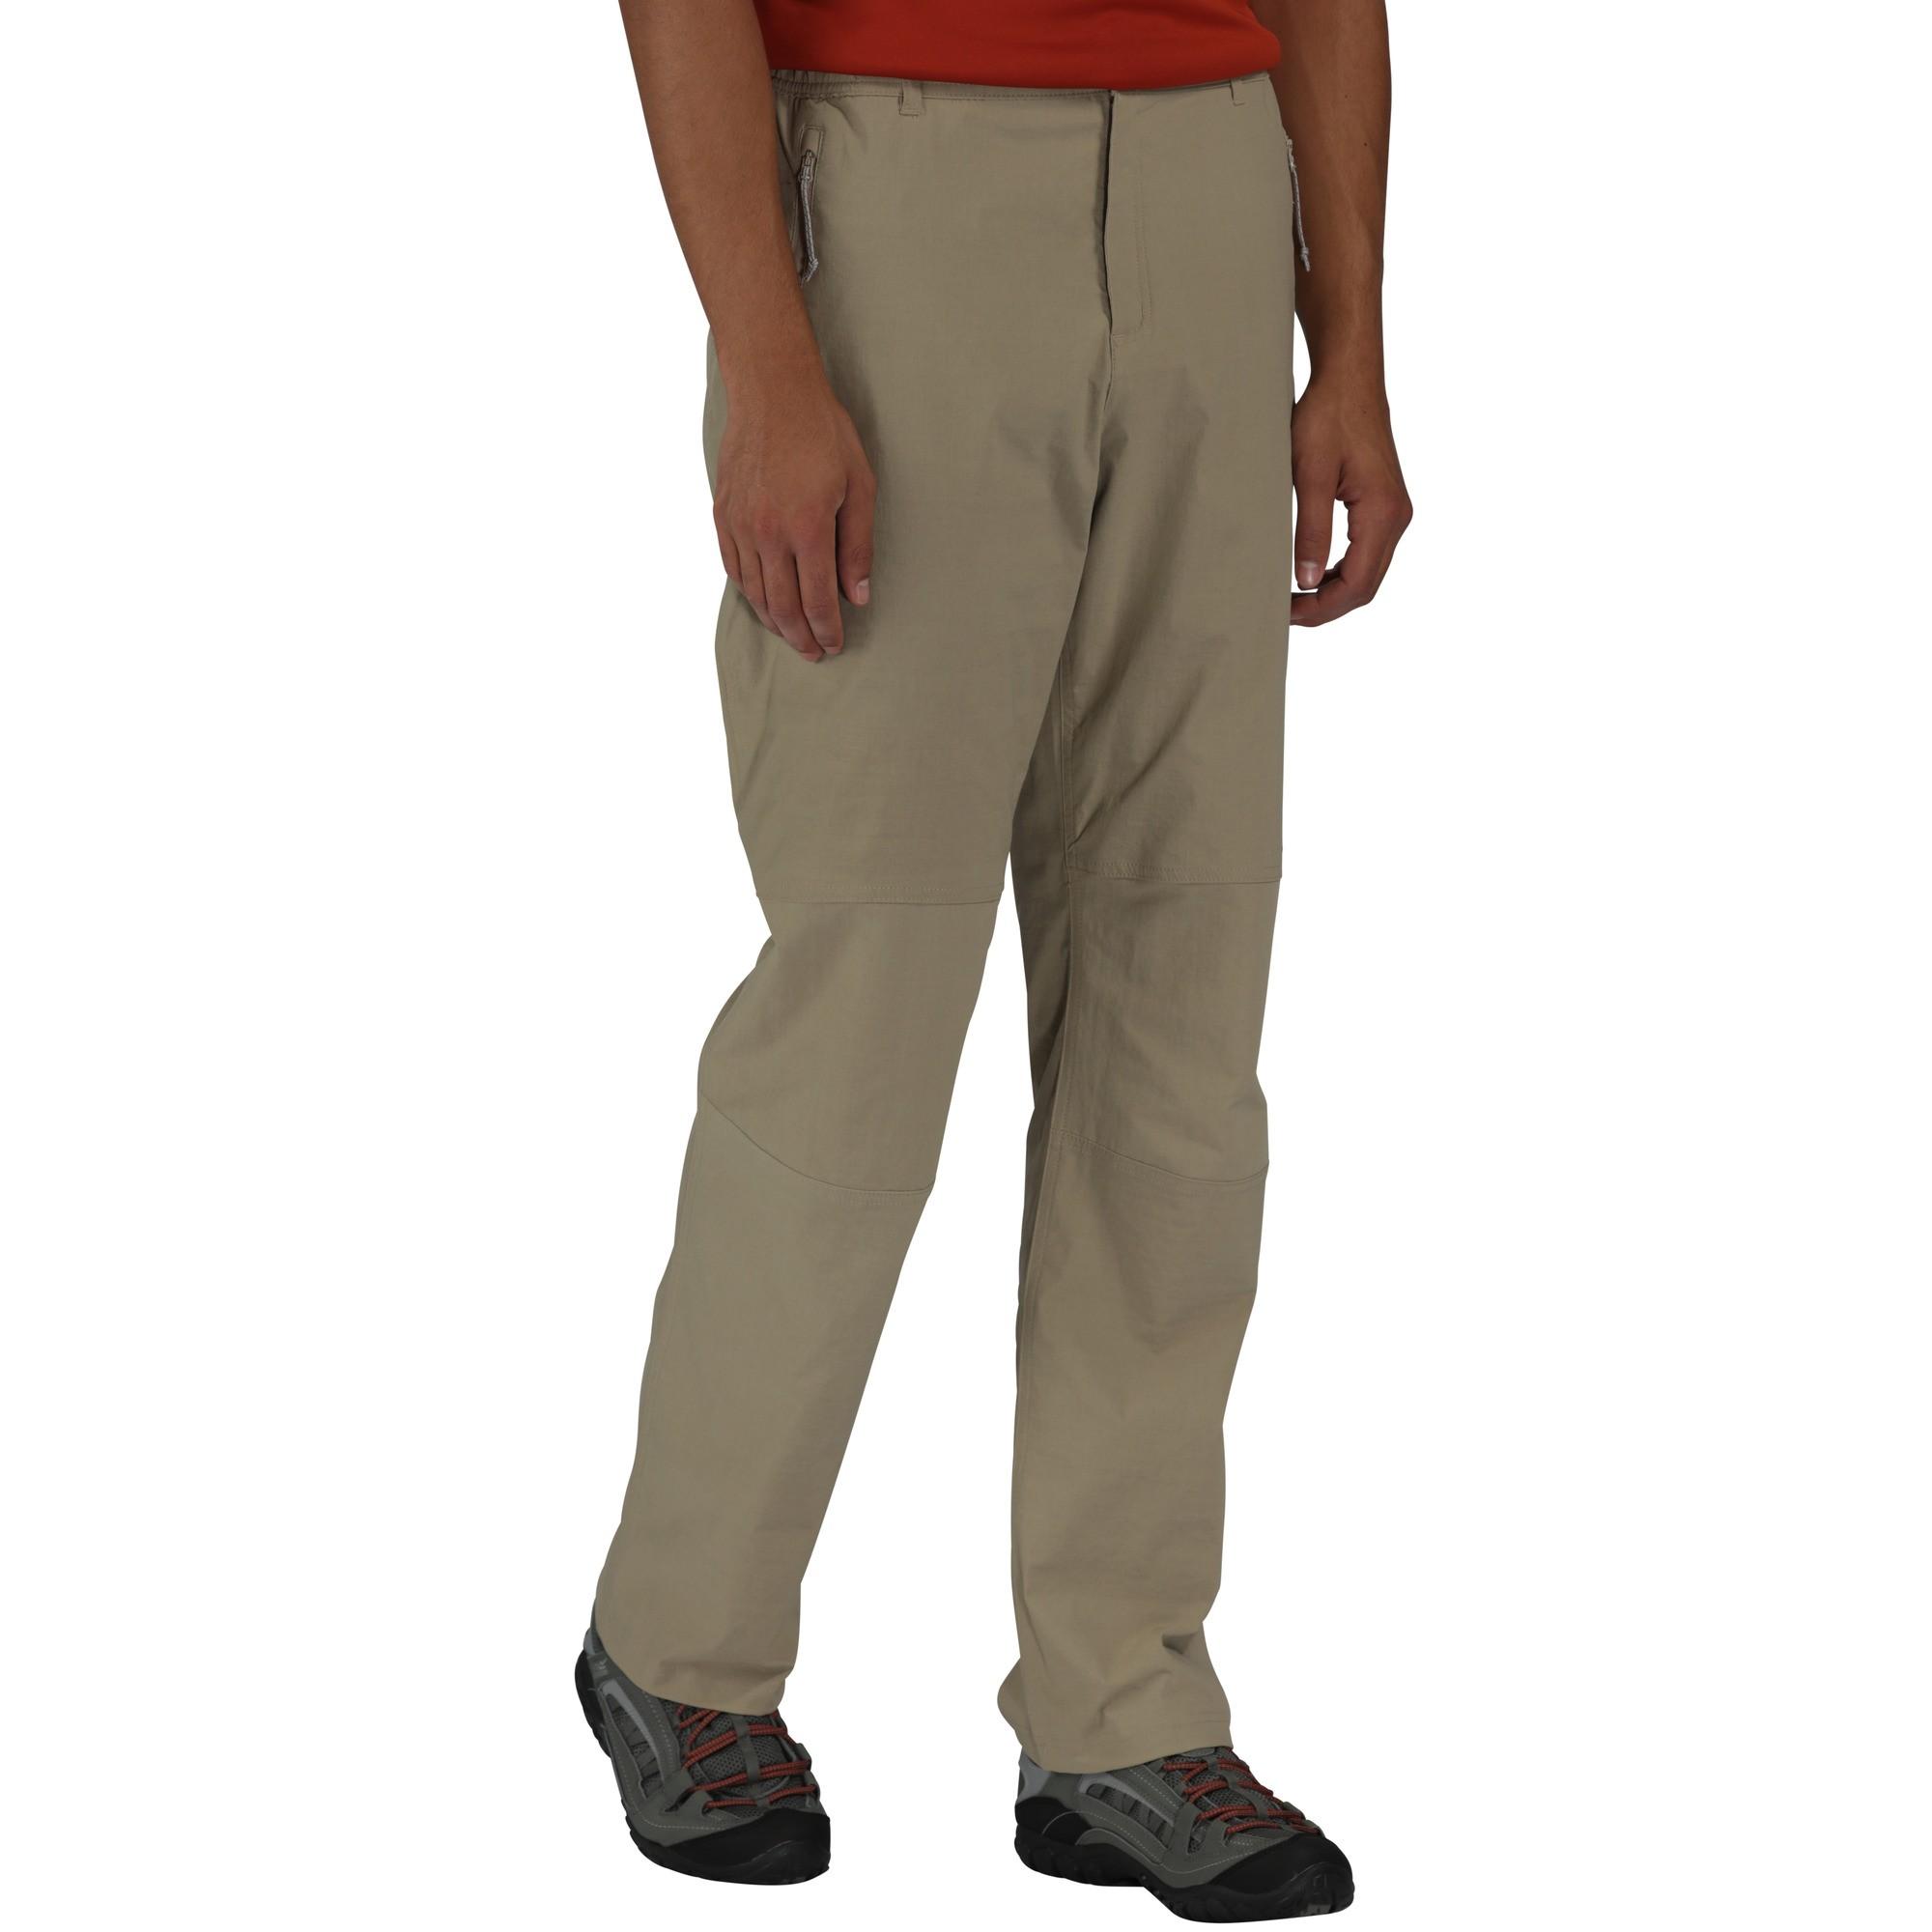 Regatta-Great-Outdoors-Mens-Fellwalk-II-Hiking-Trousers